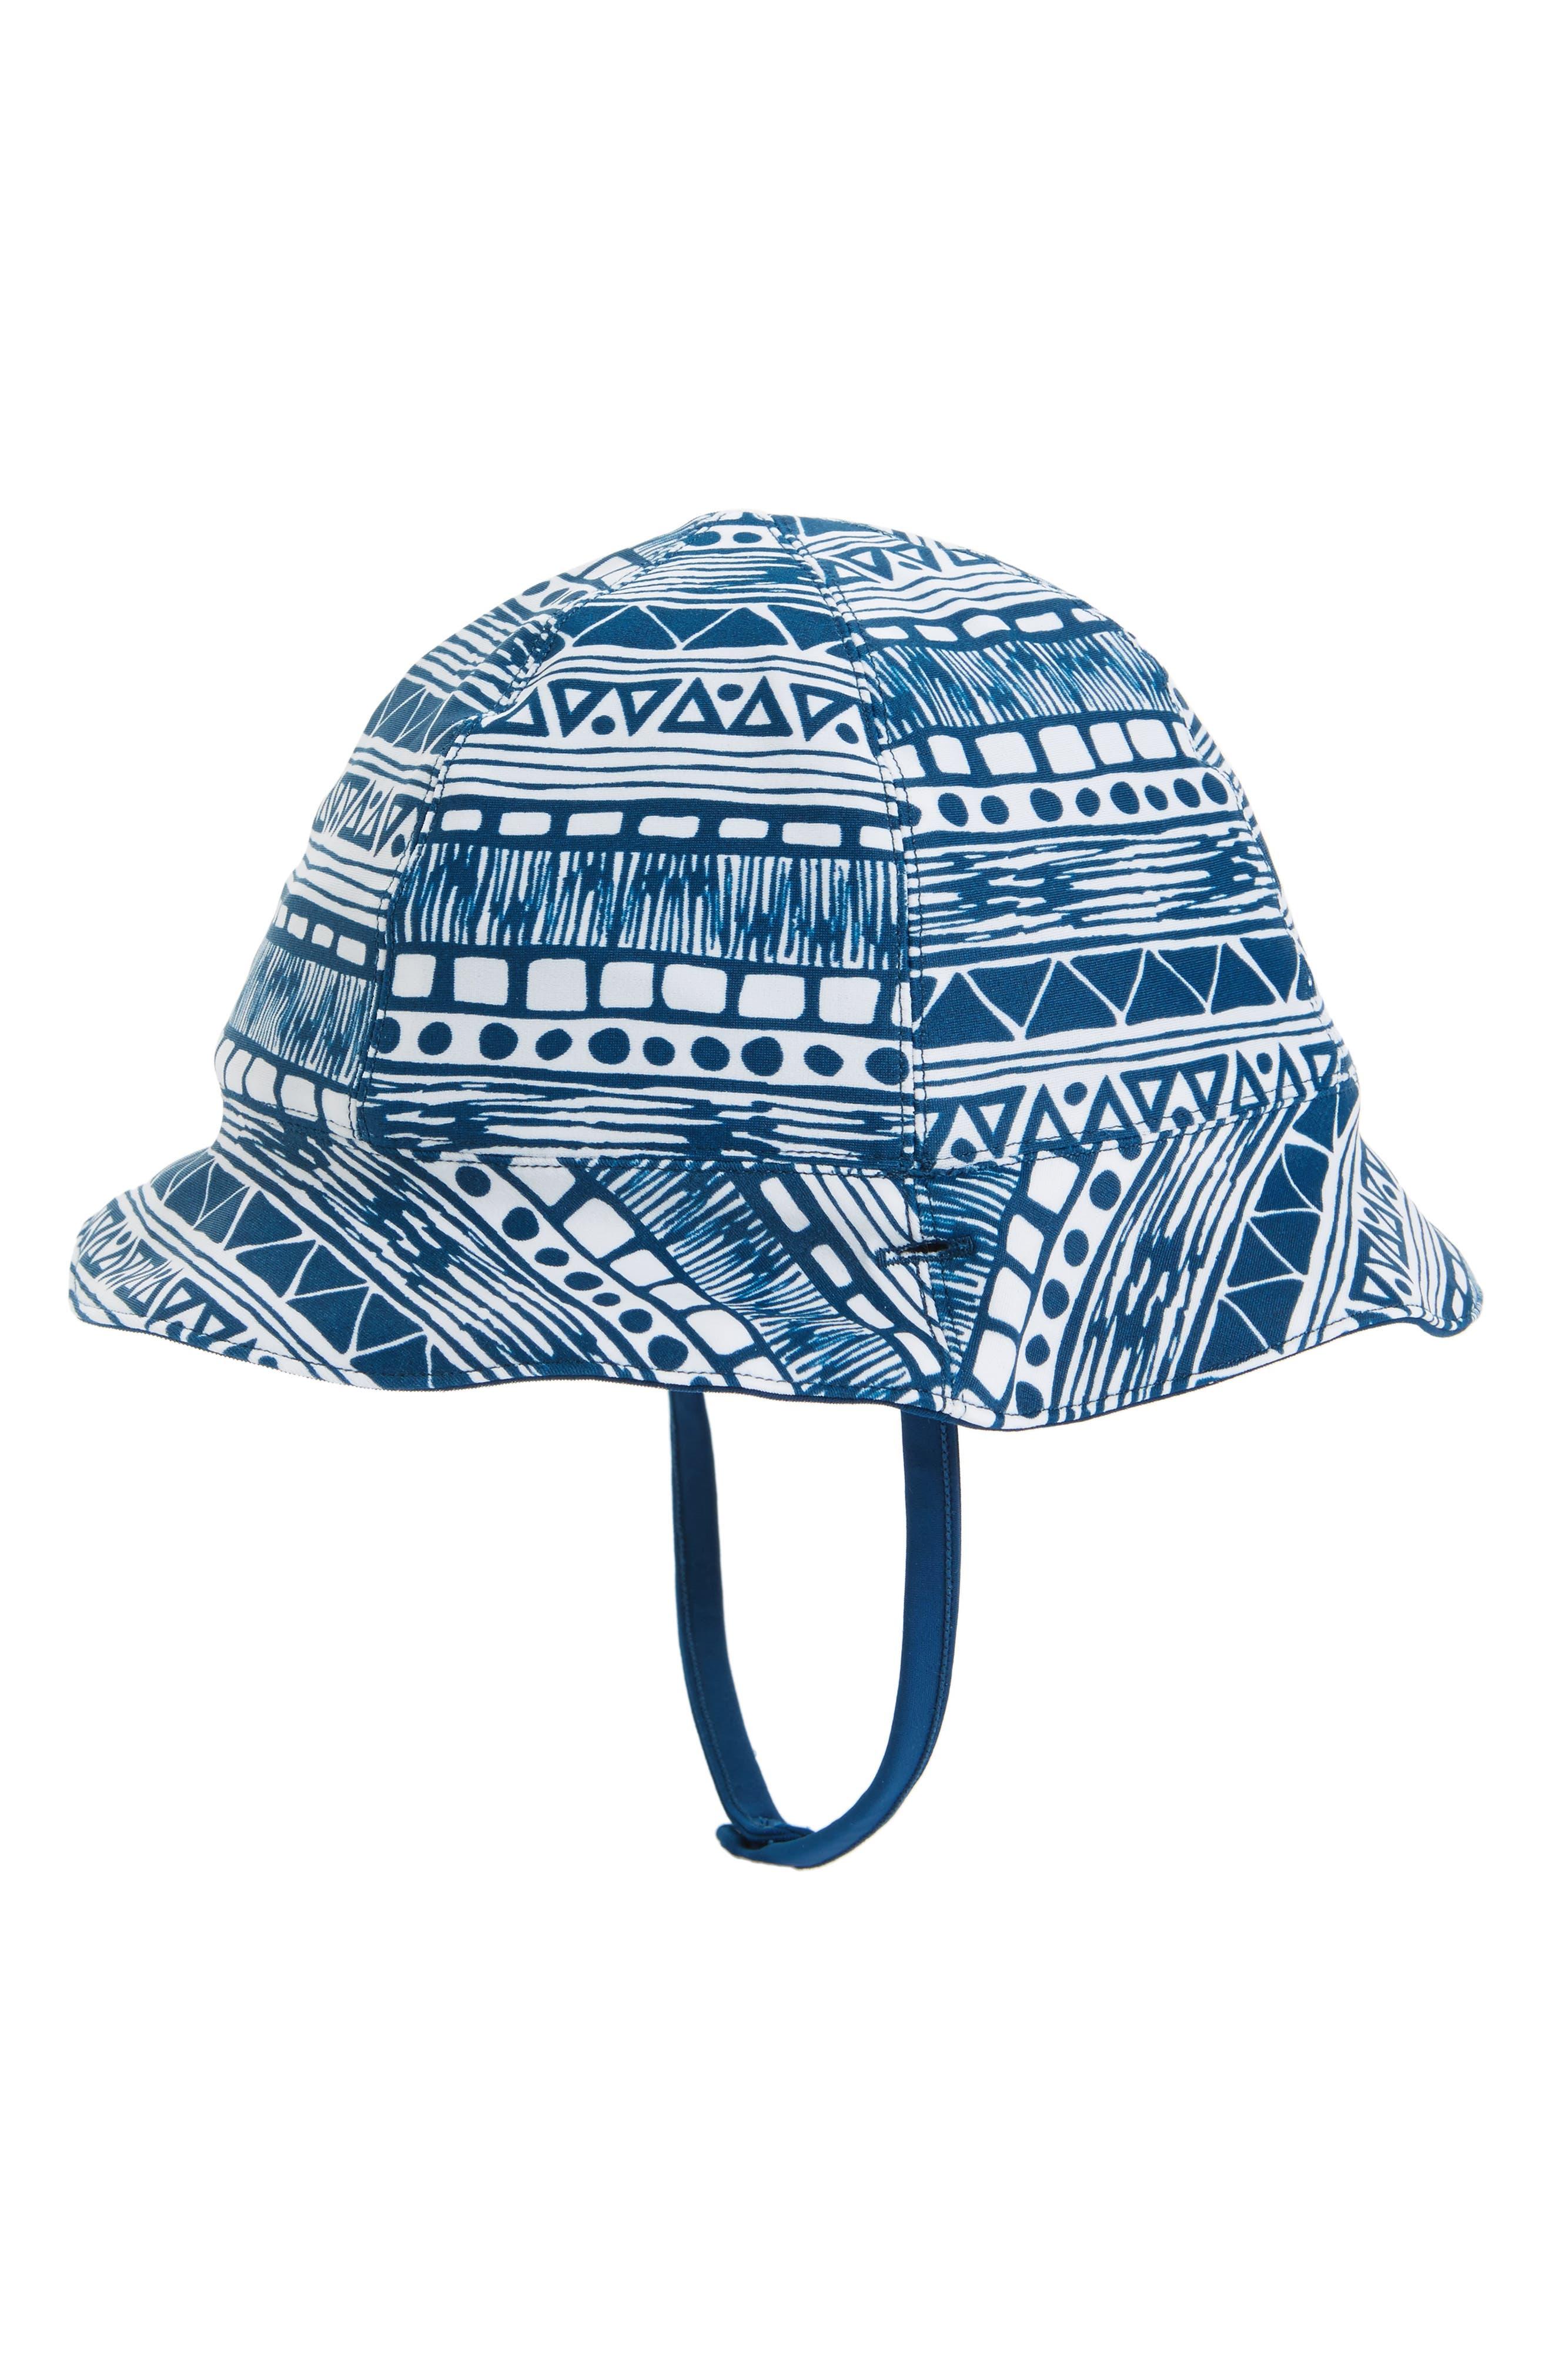 Tucker + Tate Reversible Waterproof Bucket Hat